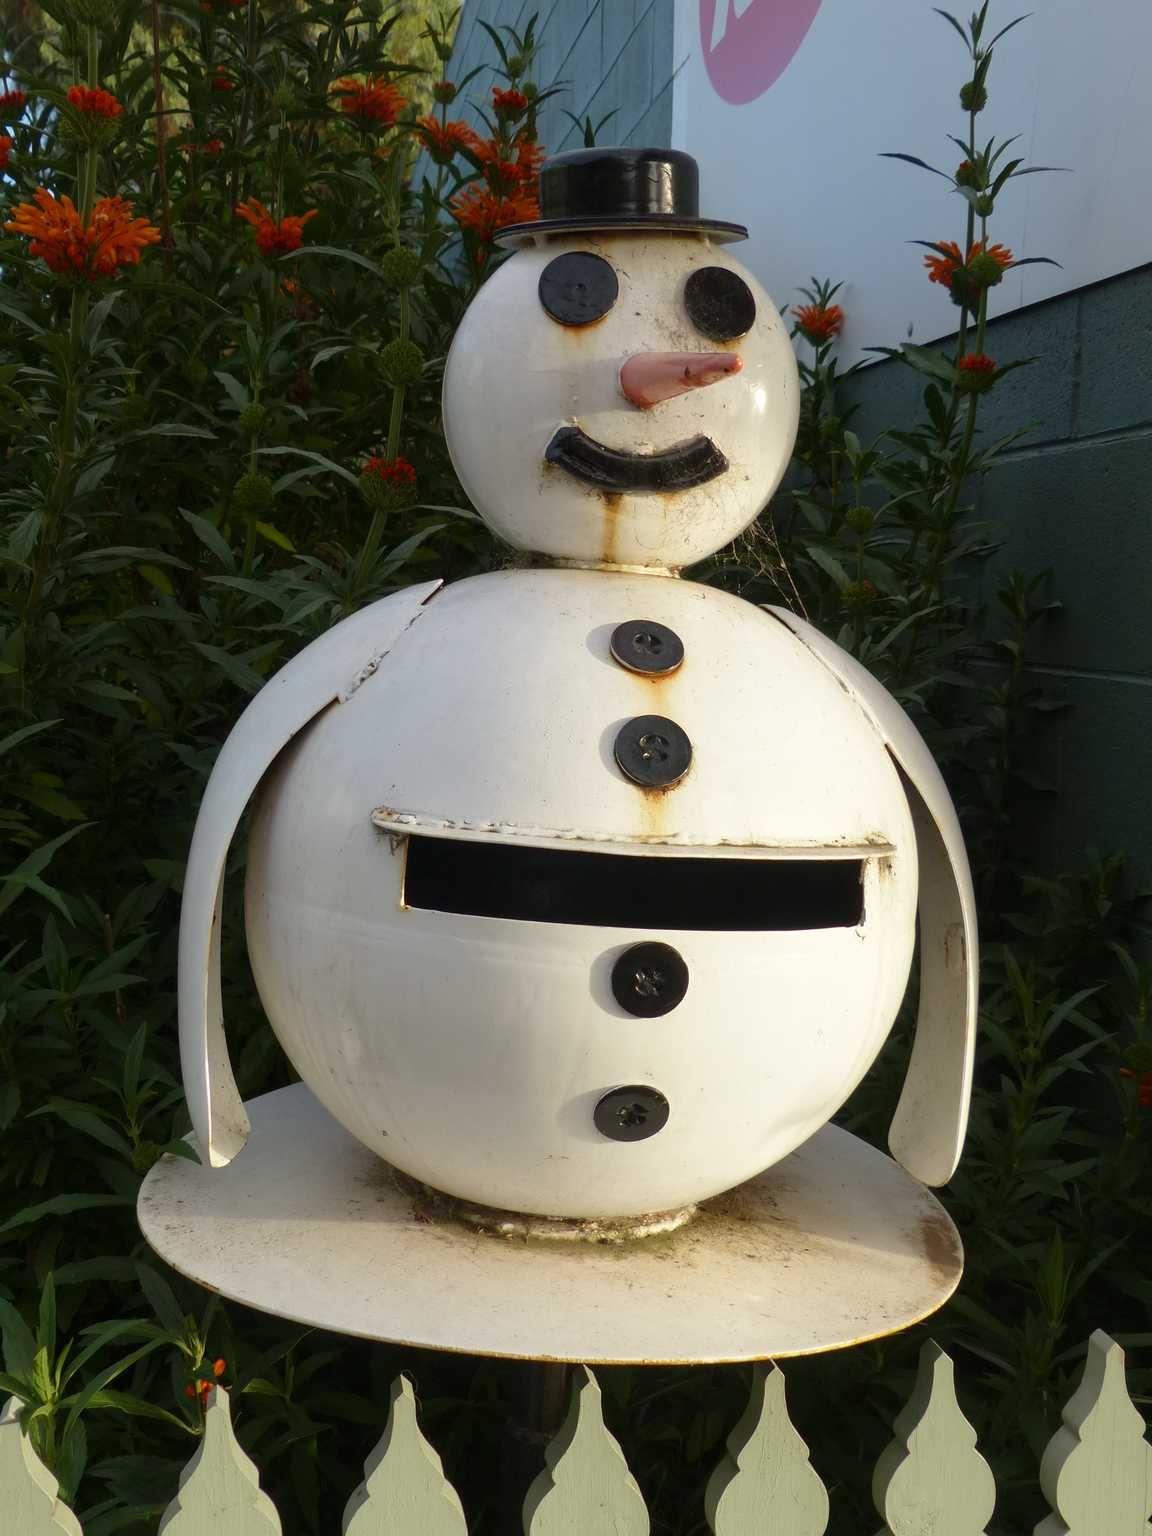 Snowman in Oz Christmas ornaments, Holiday decor